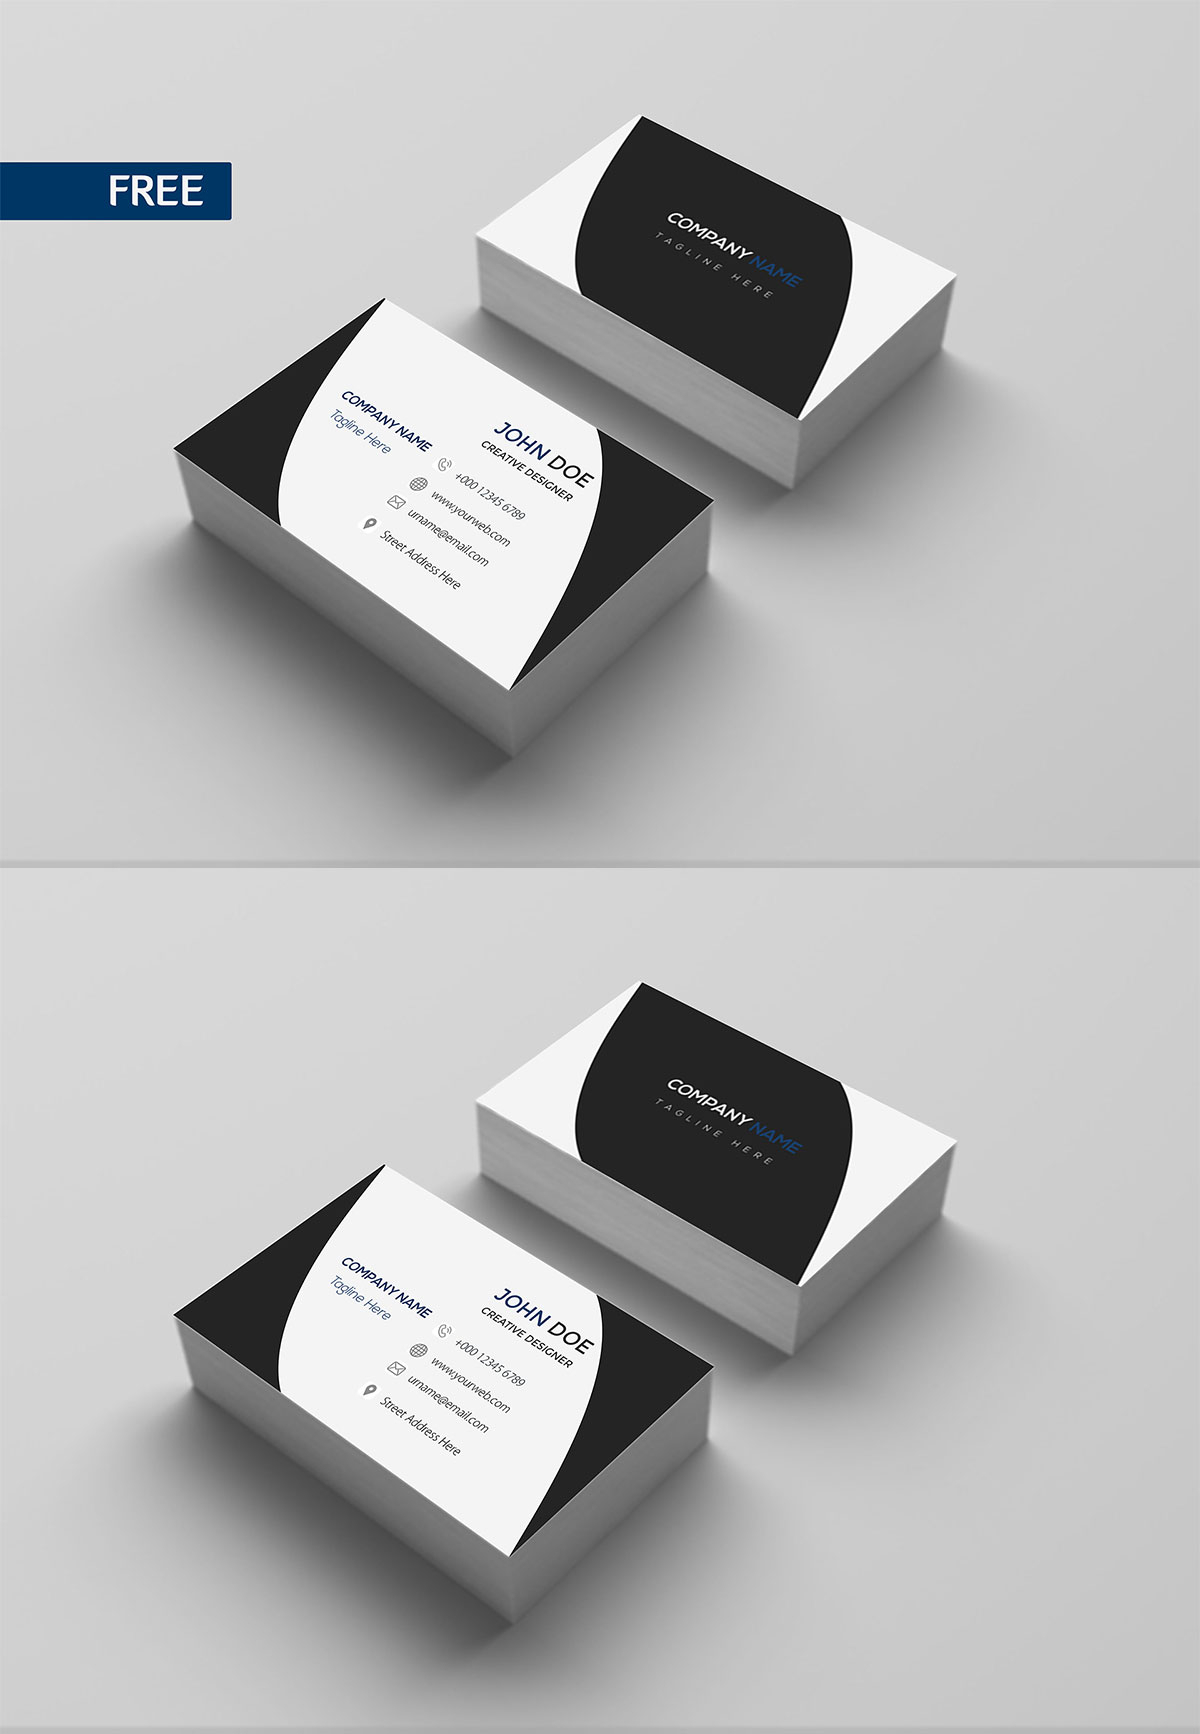 Free Print Design Business Card Template - Creativetacos In Free Bussiness Card Template